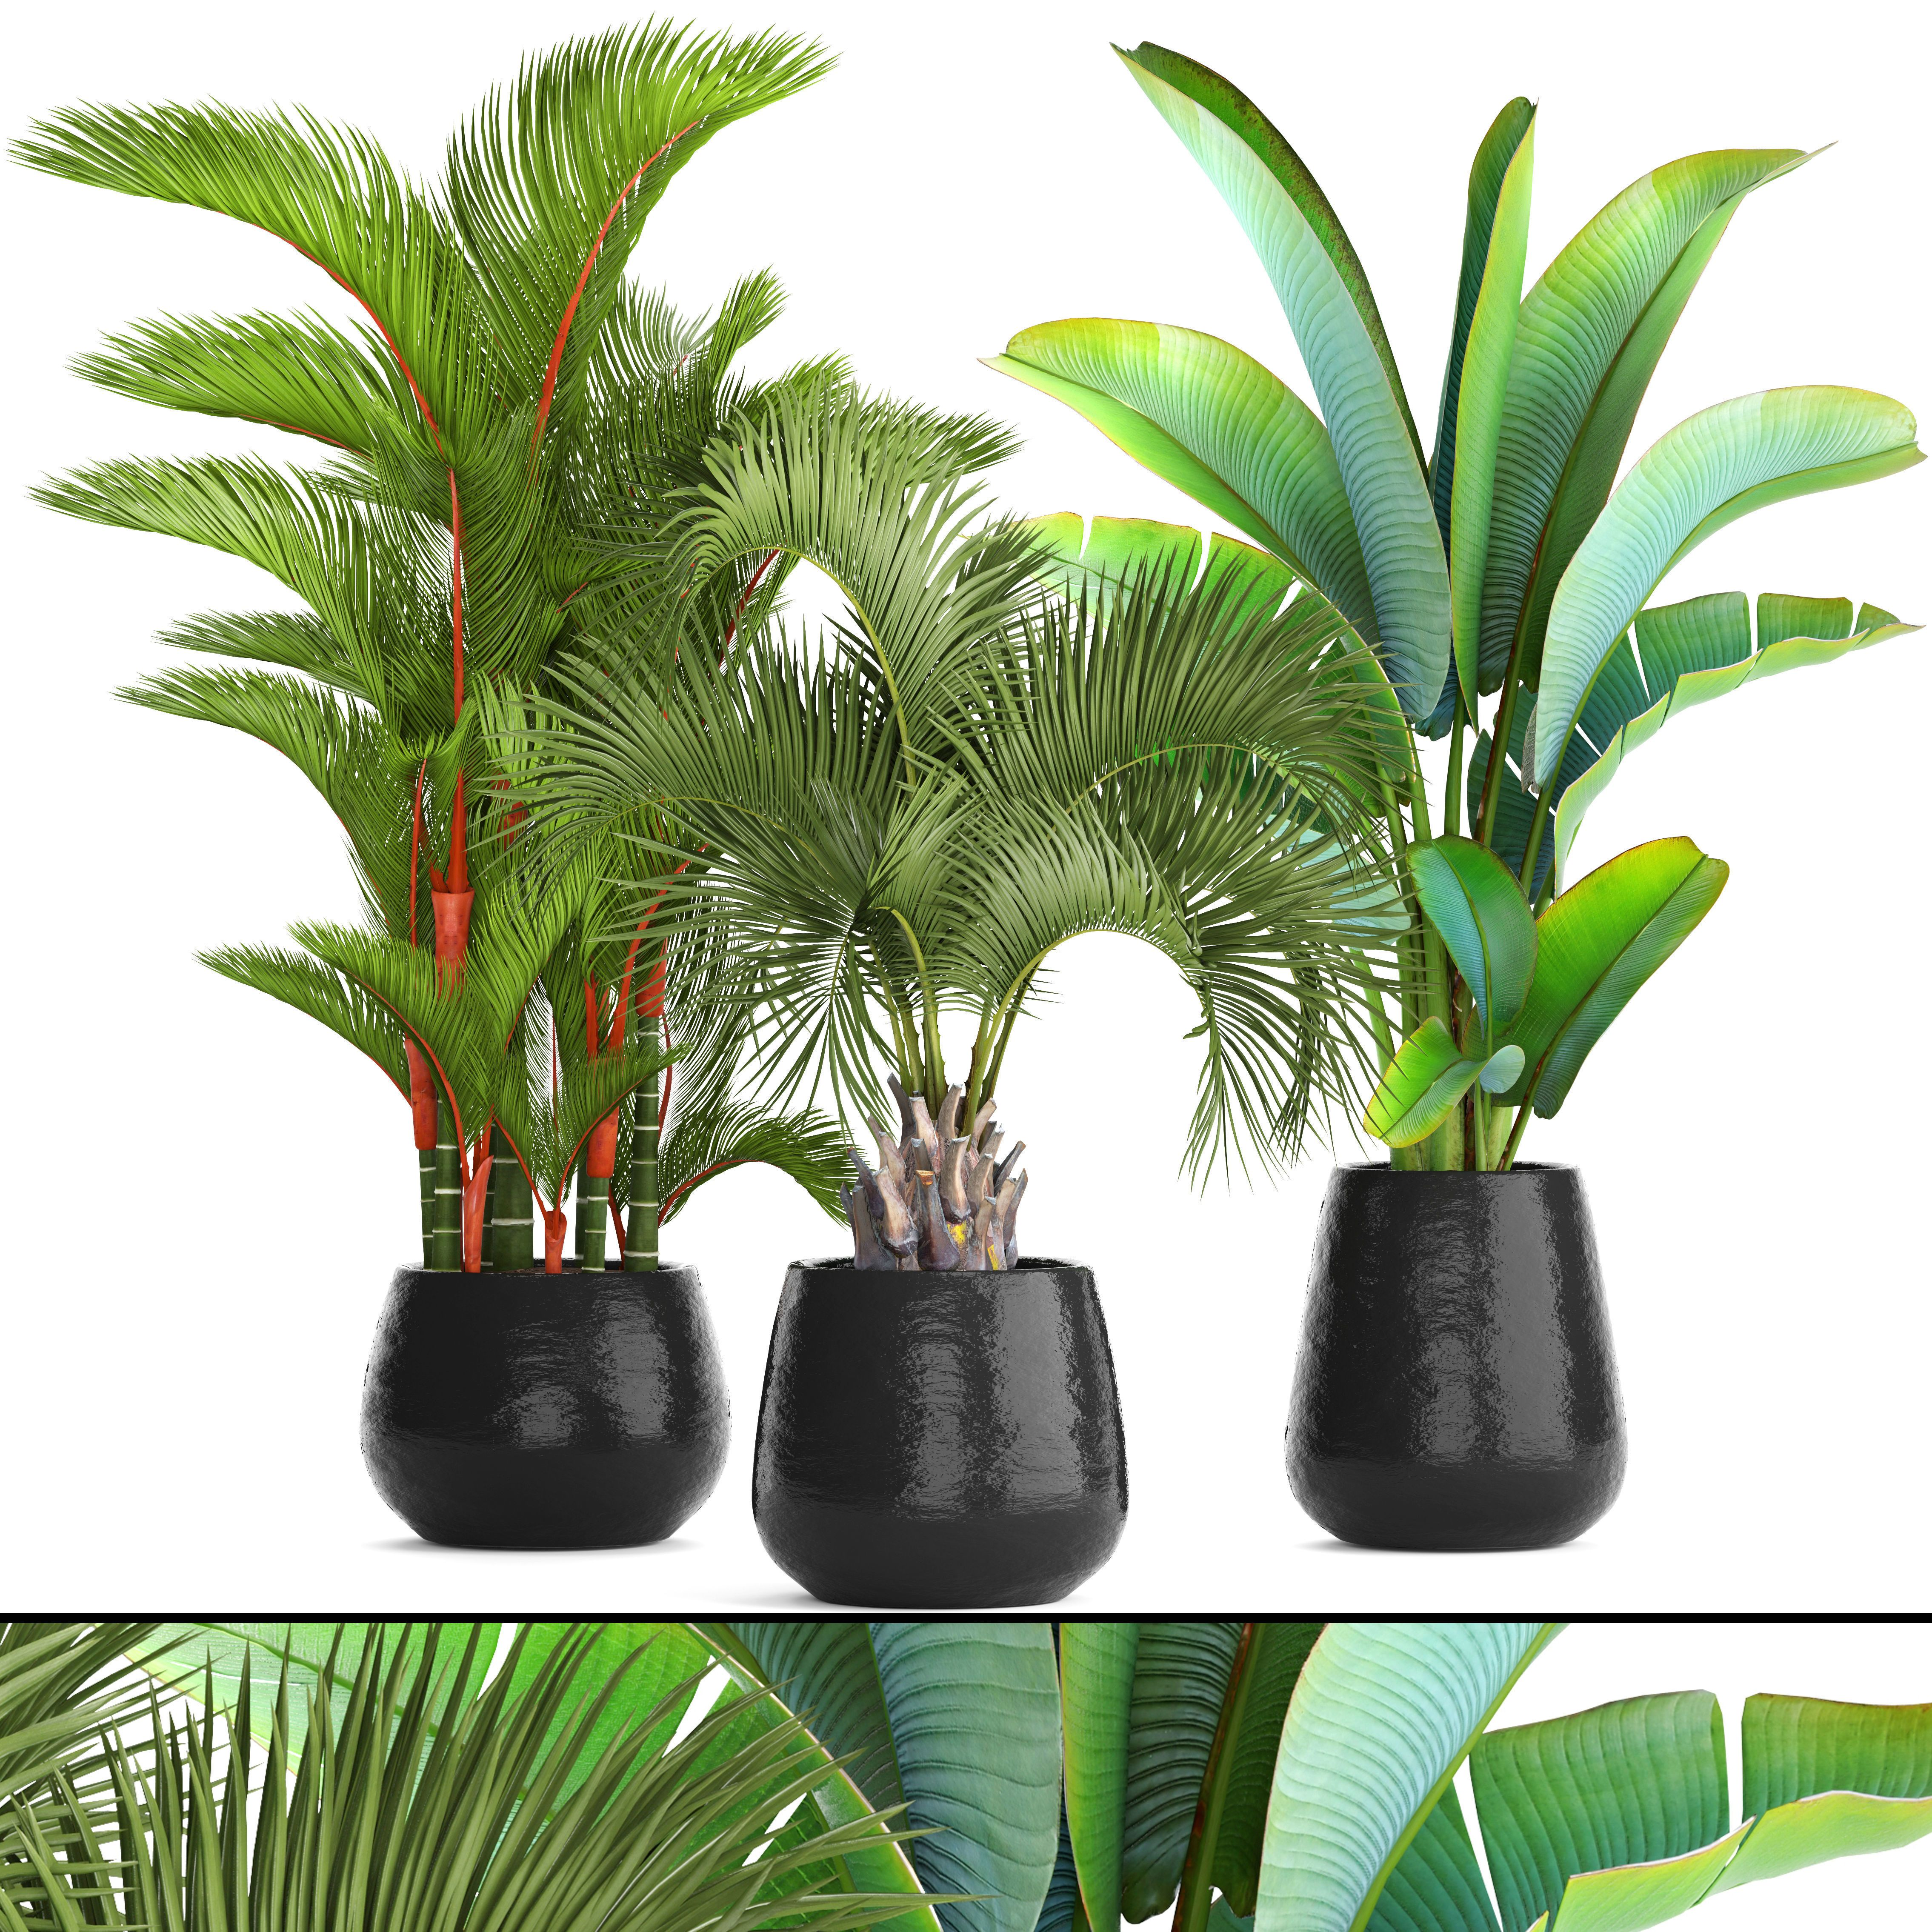 3d Plants Model 340 Free Download | Plant | Plants, Model, Free